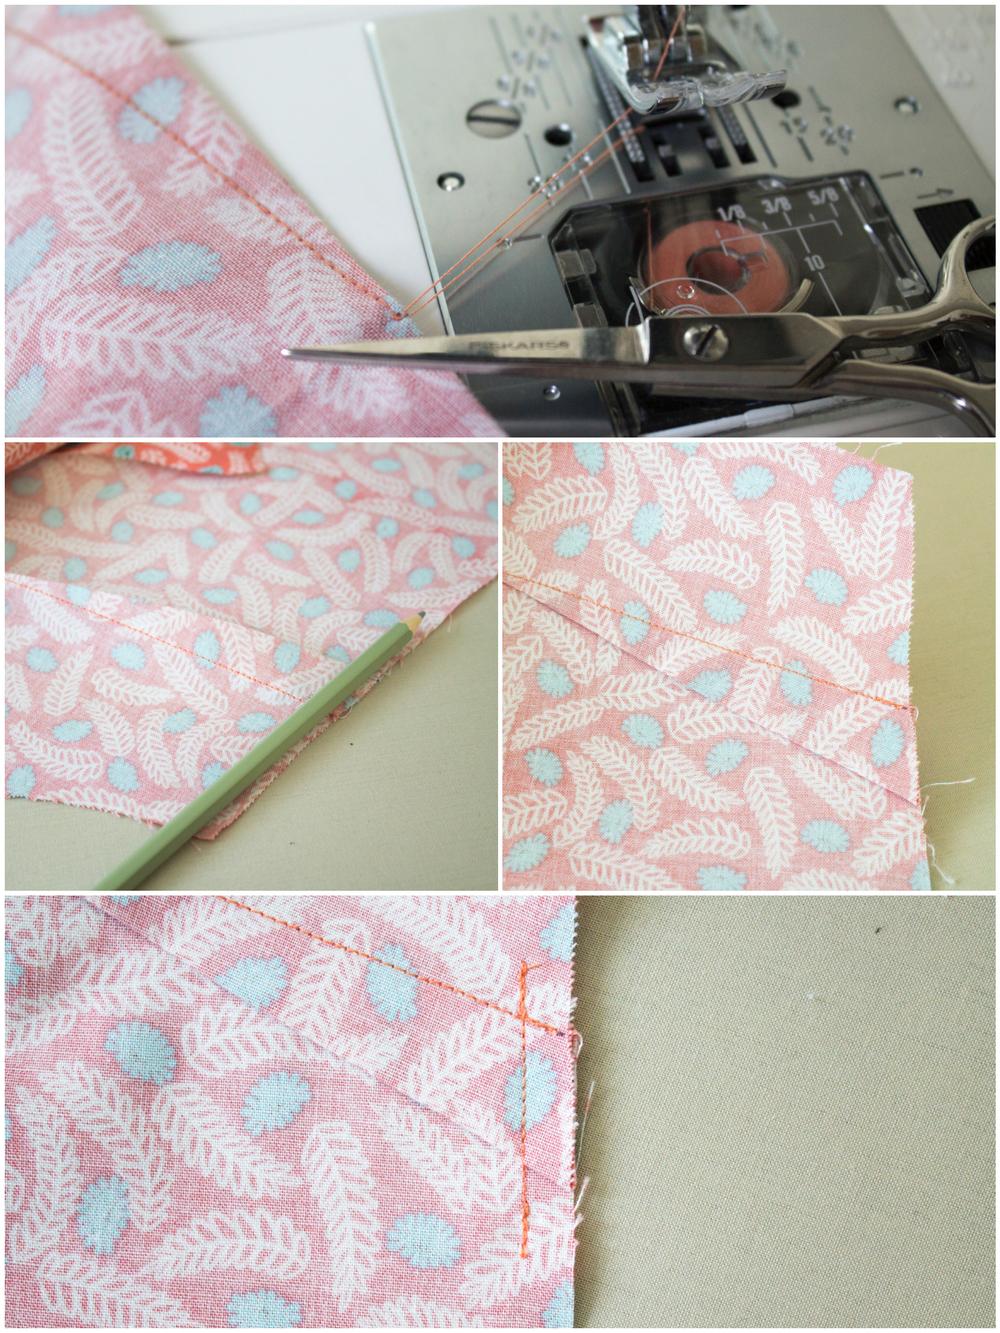 inkbyjeng_diy_sewing_racerback_tank_top_sewing_darts.jpg